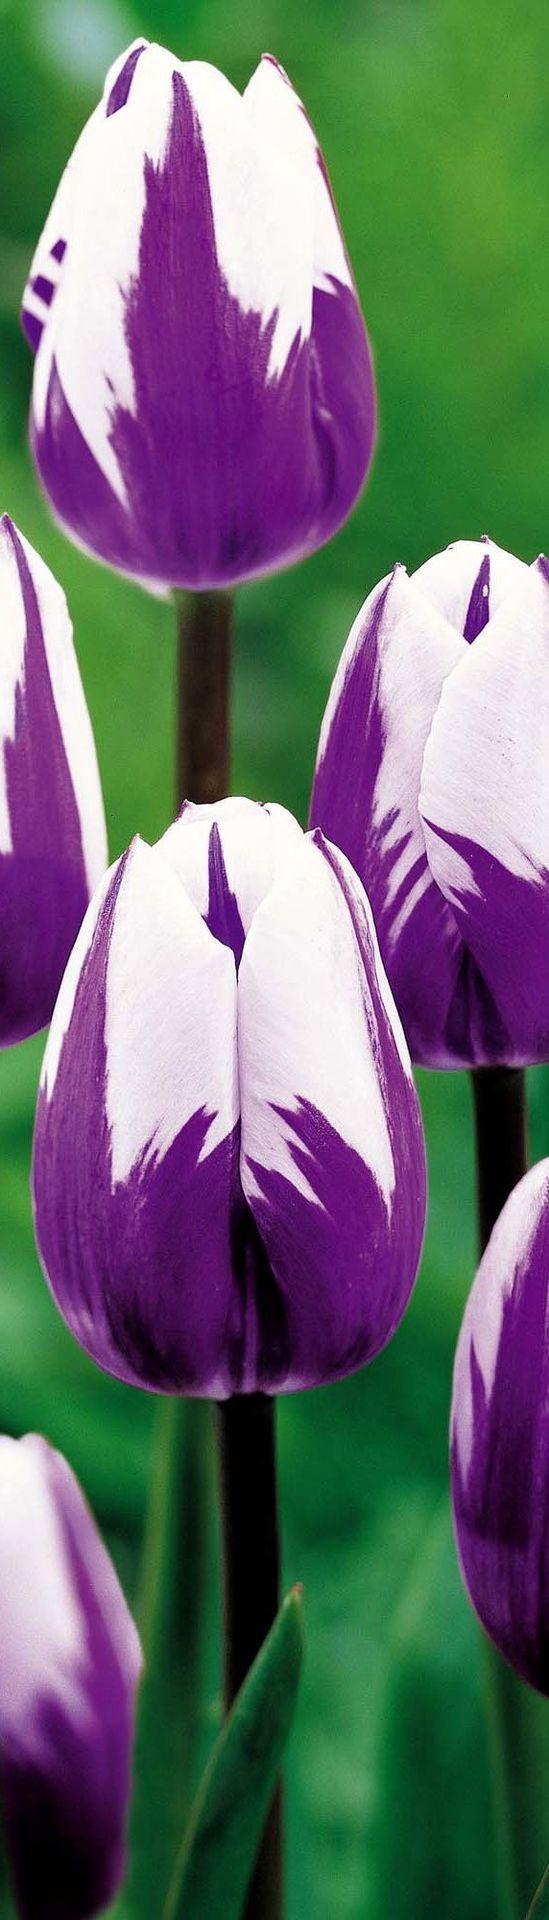 White & Purple Tulips